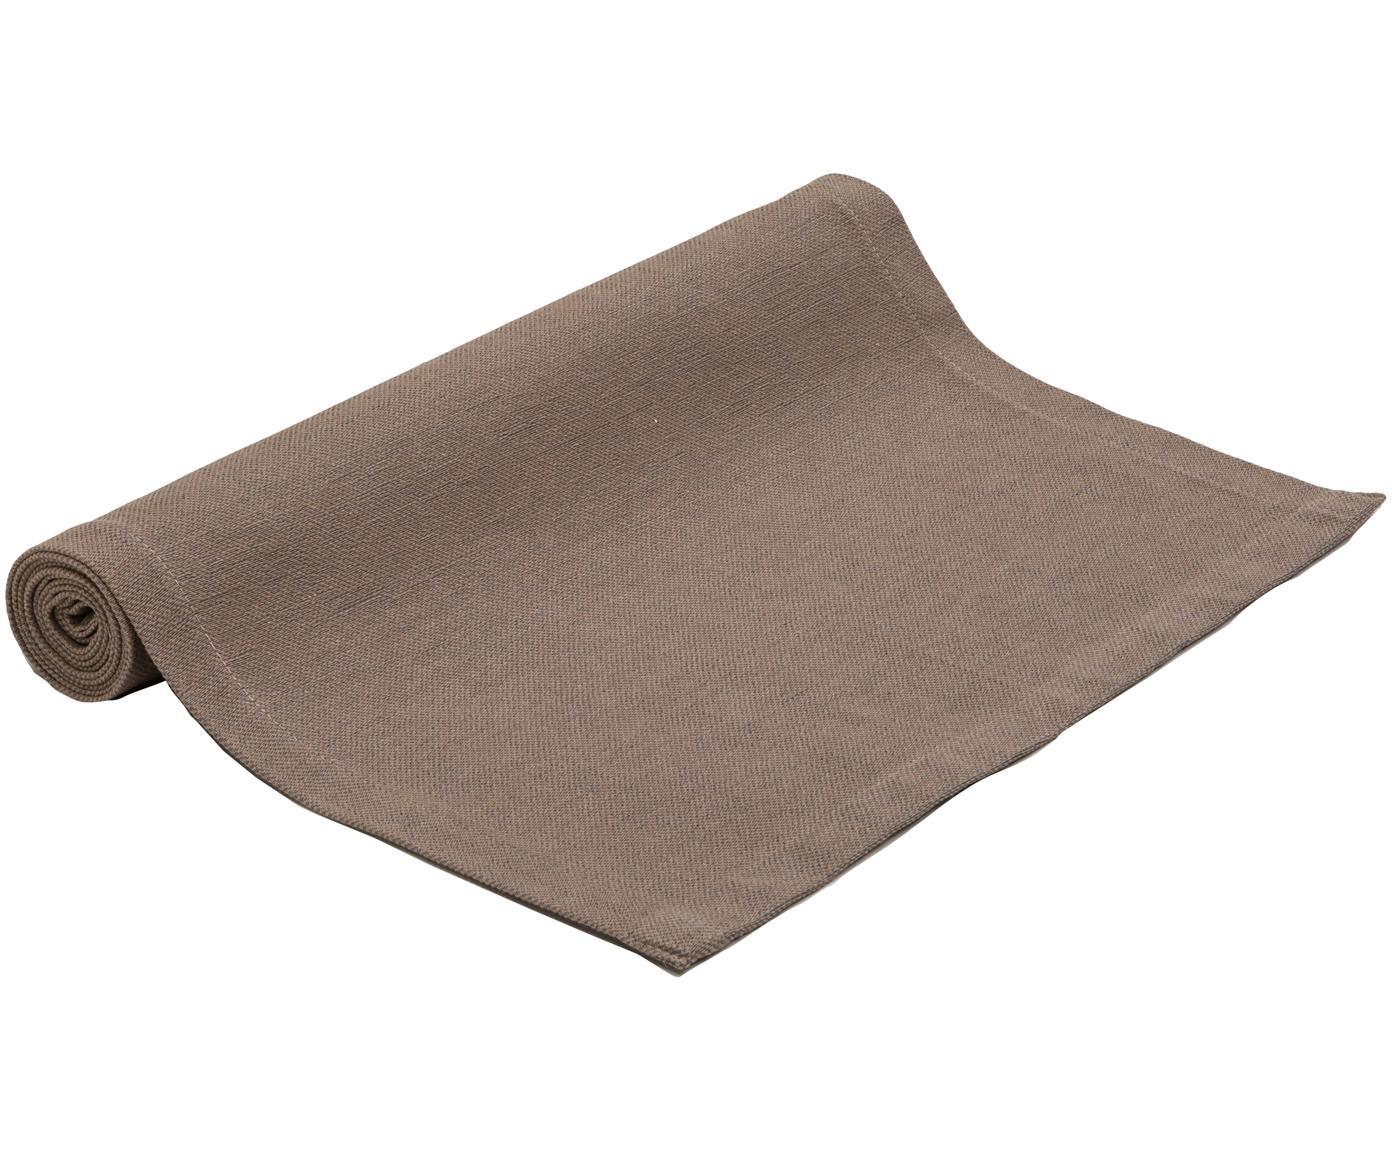 Camino de mesa Riva, 55%algodón, 45%poliéster, Gris pardo, An 40 x L 150 cm